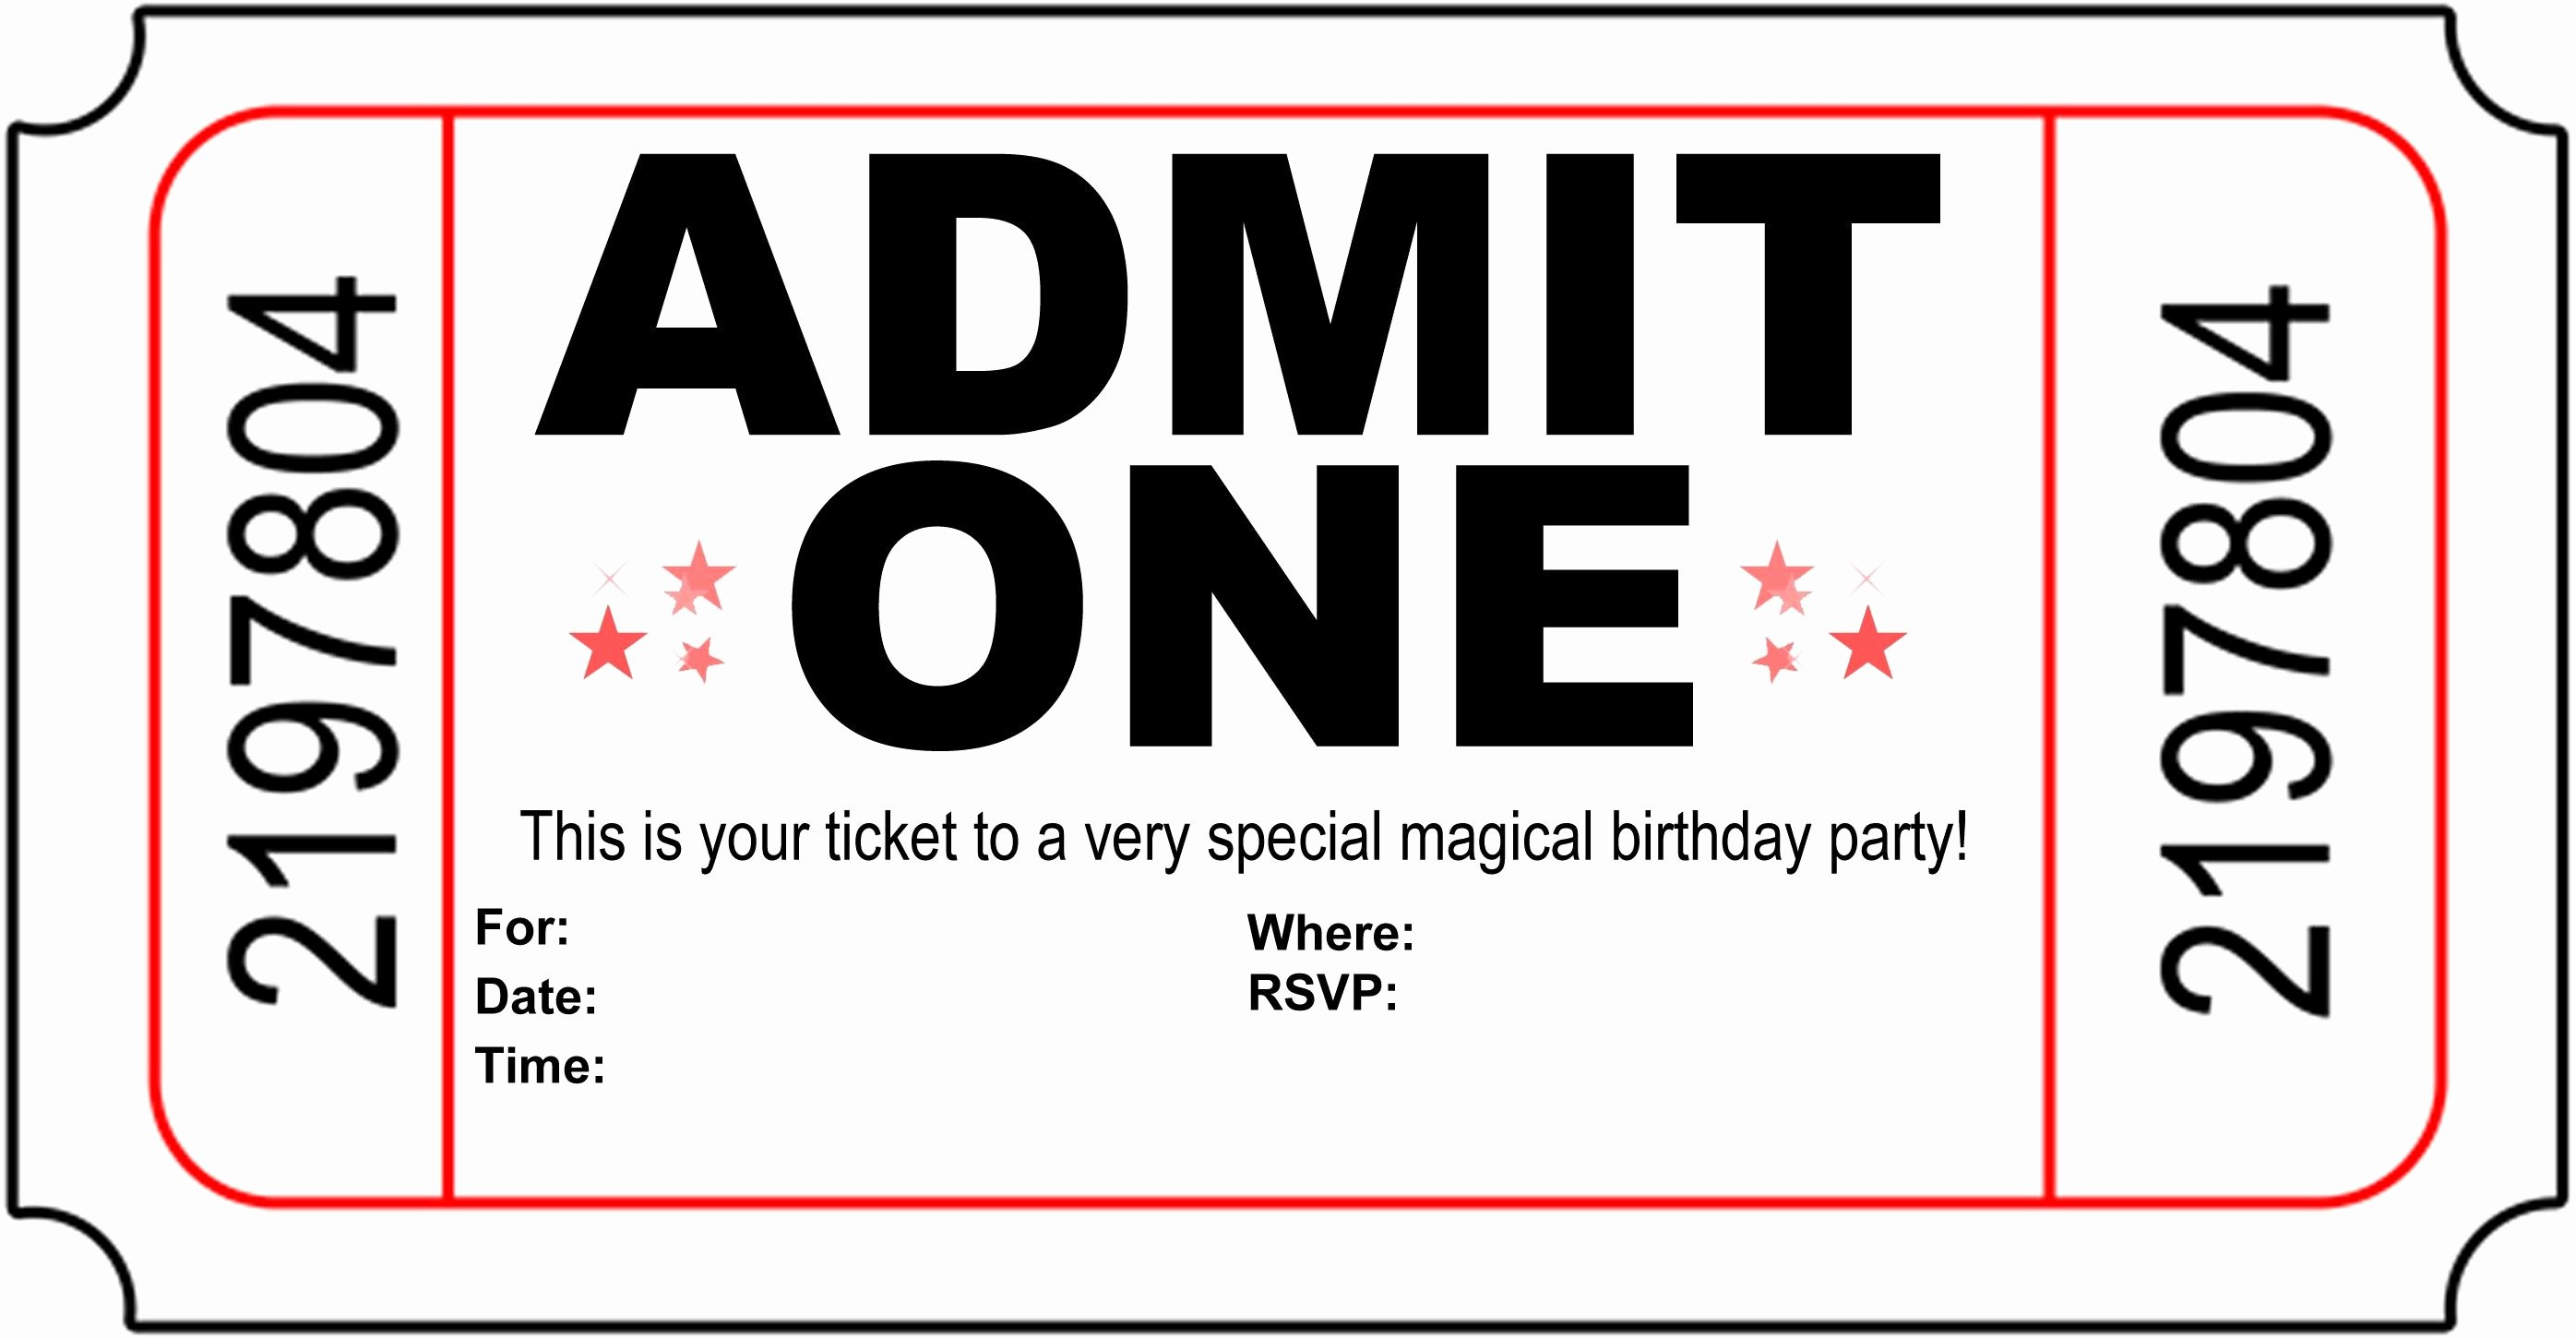 Movie Ticket Invitation Template Free Beautiful Polar Express Invitation Template Free